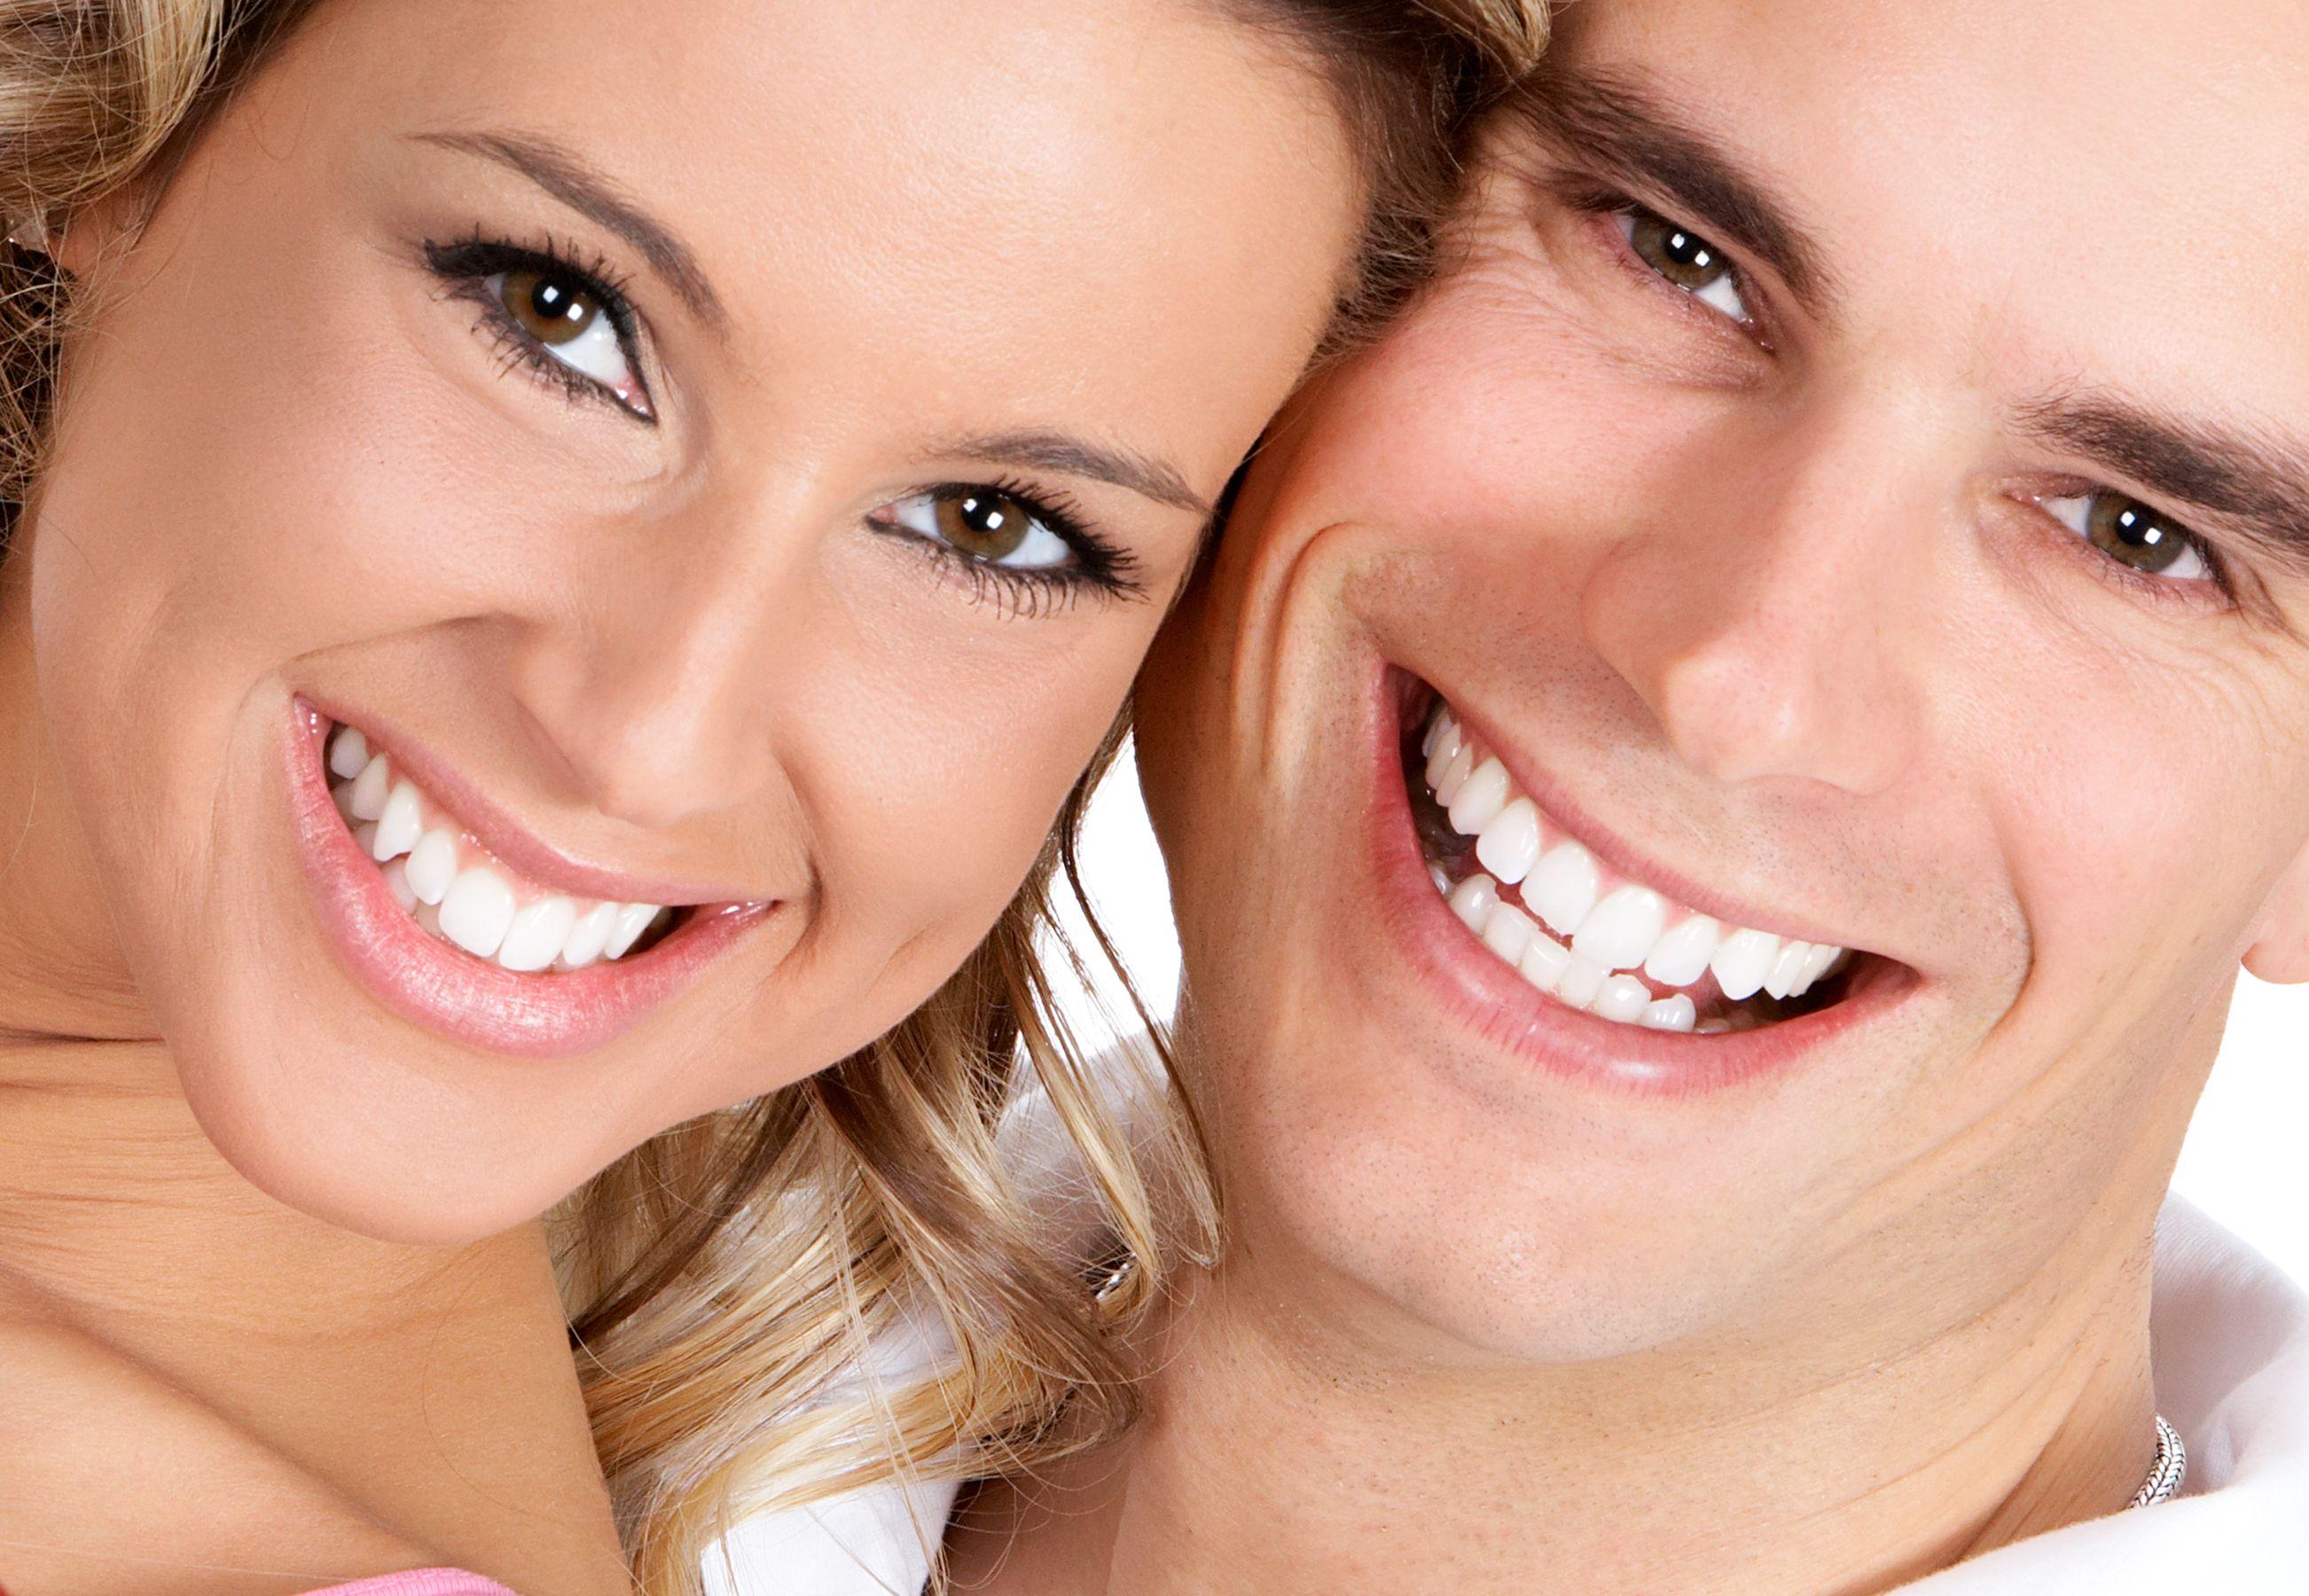 Teeth Whitening in Mount Laurel